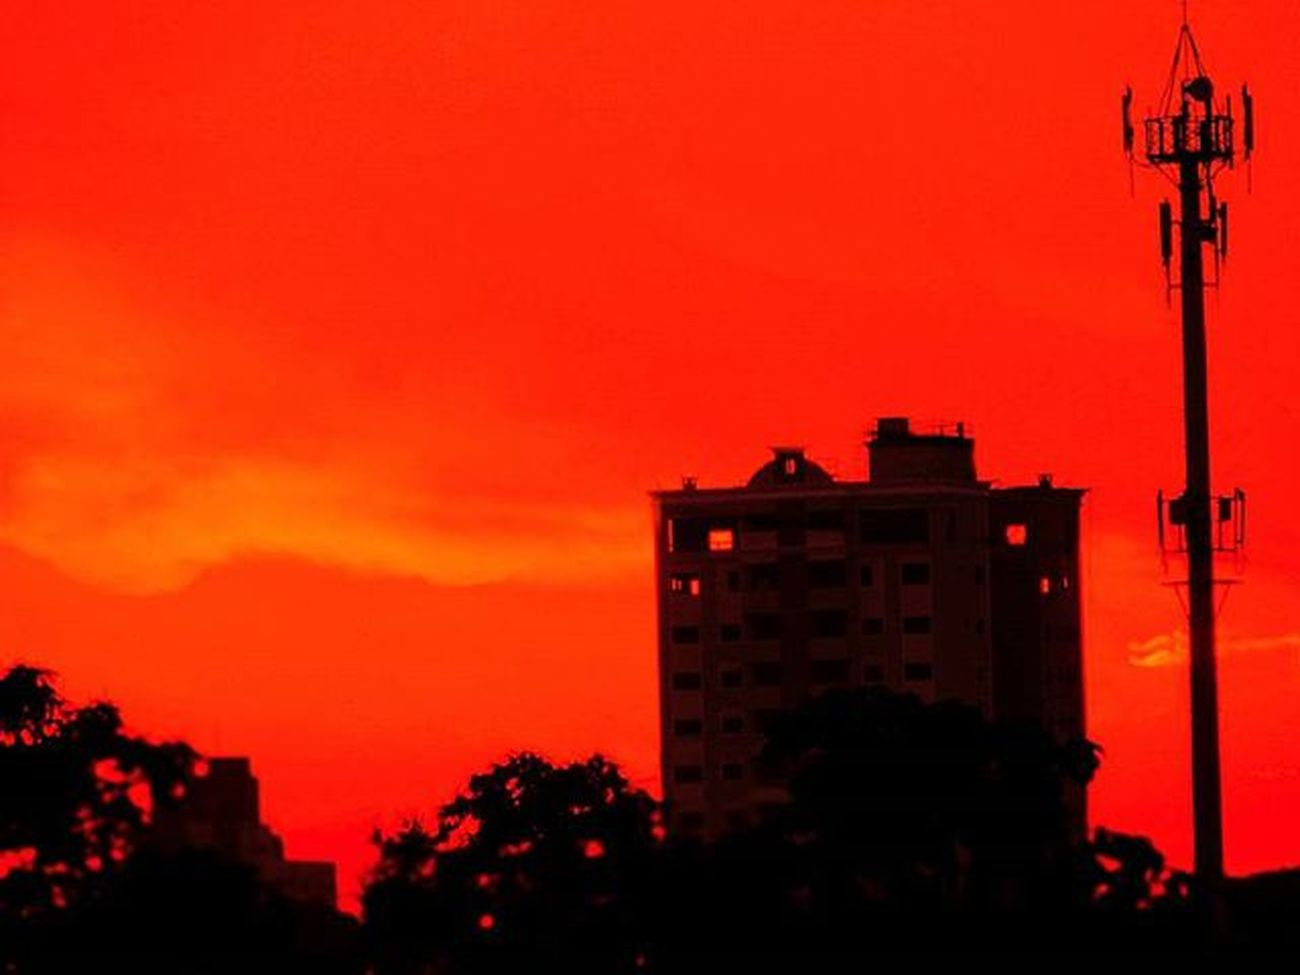 Sunset Sunsets Sunsetlovers Sunsetdobrasil Sunsetsmax Skyline Great_captures_nature Great_captures_brasil Naturelovers Nature Nature_perfection